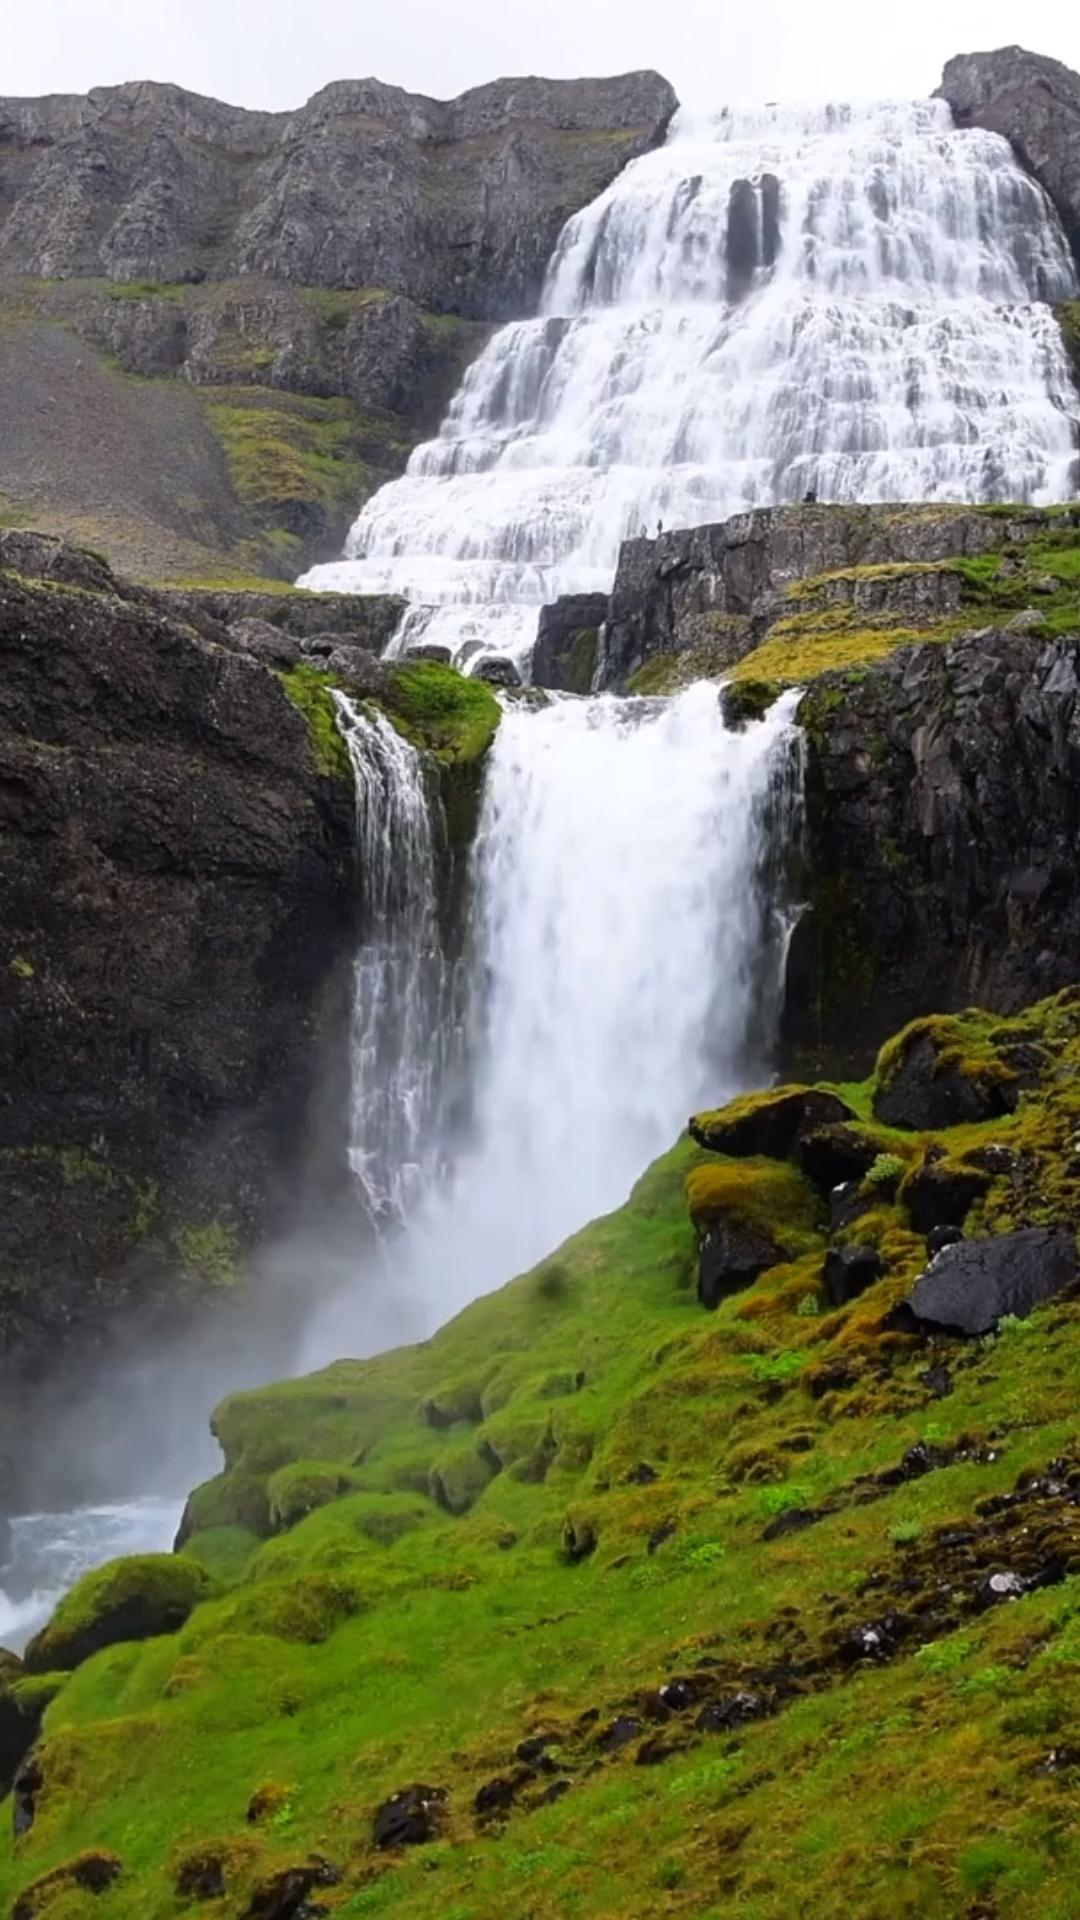 Campervan Iceland Trip • 15 Helpful Tips to Surviv